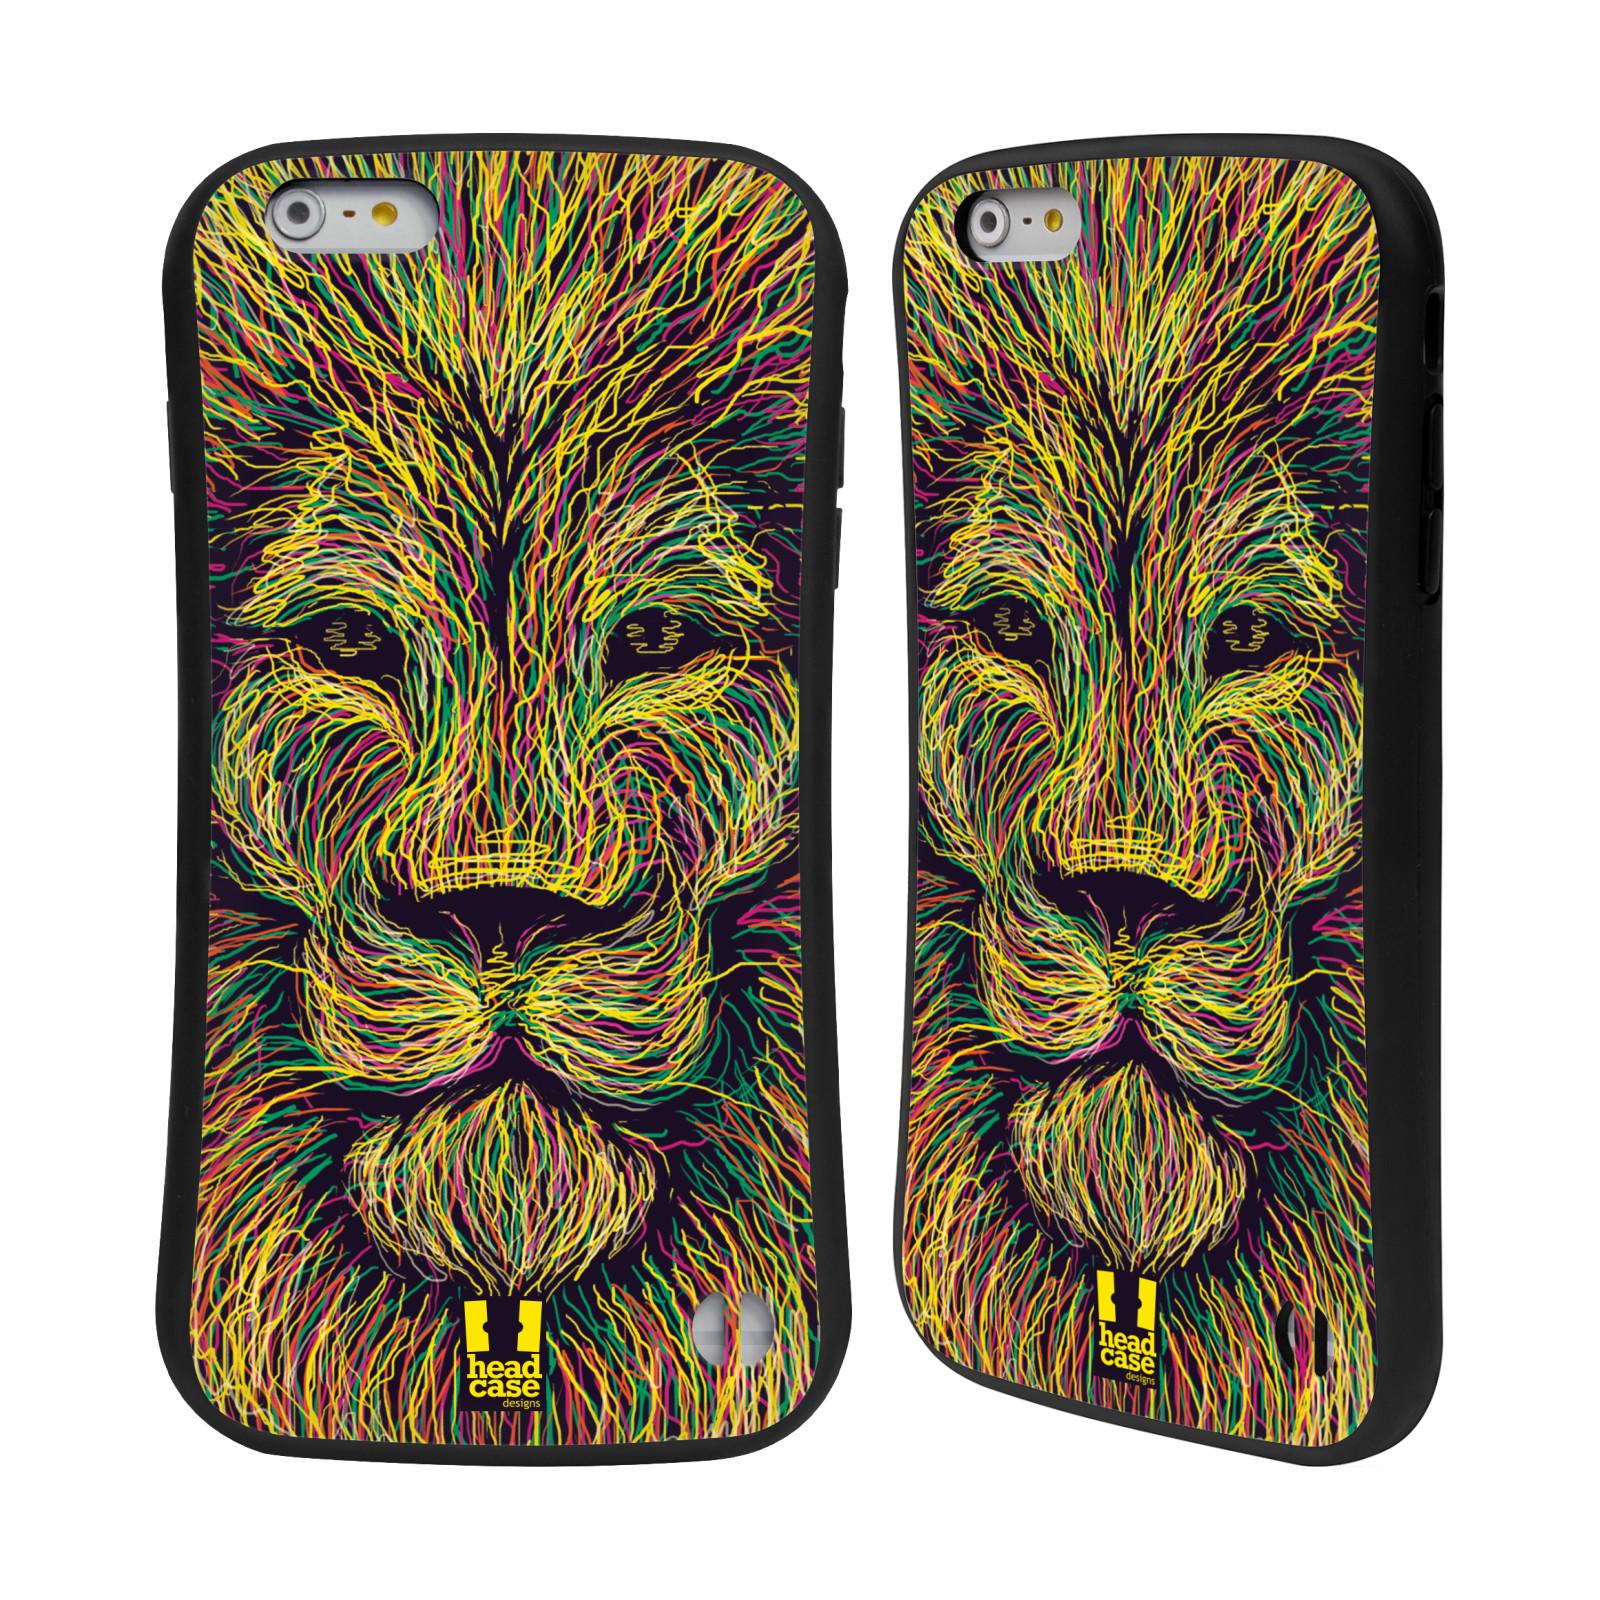 HEAD CASE silikon/plast odolný obal na mobil Apple Iphone 6 PLUS / 6S PLUS vzor zvíře čmáranice lev